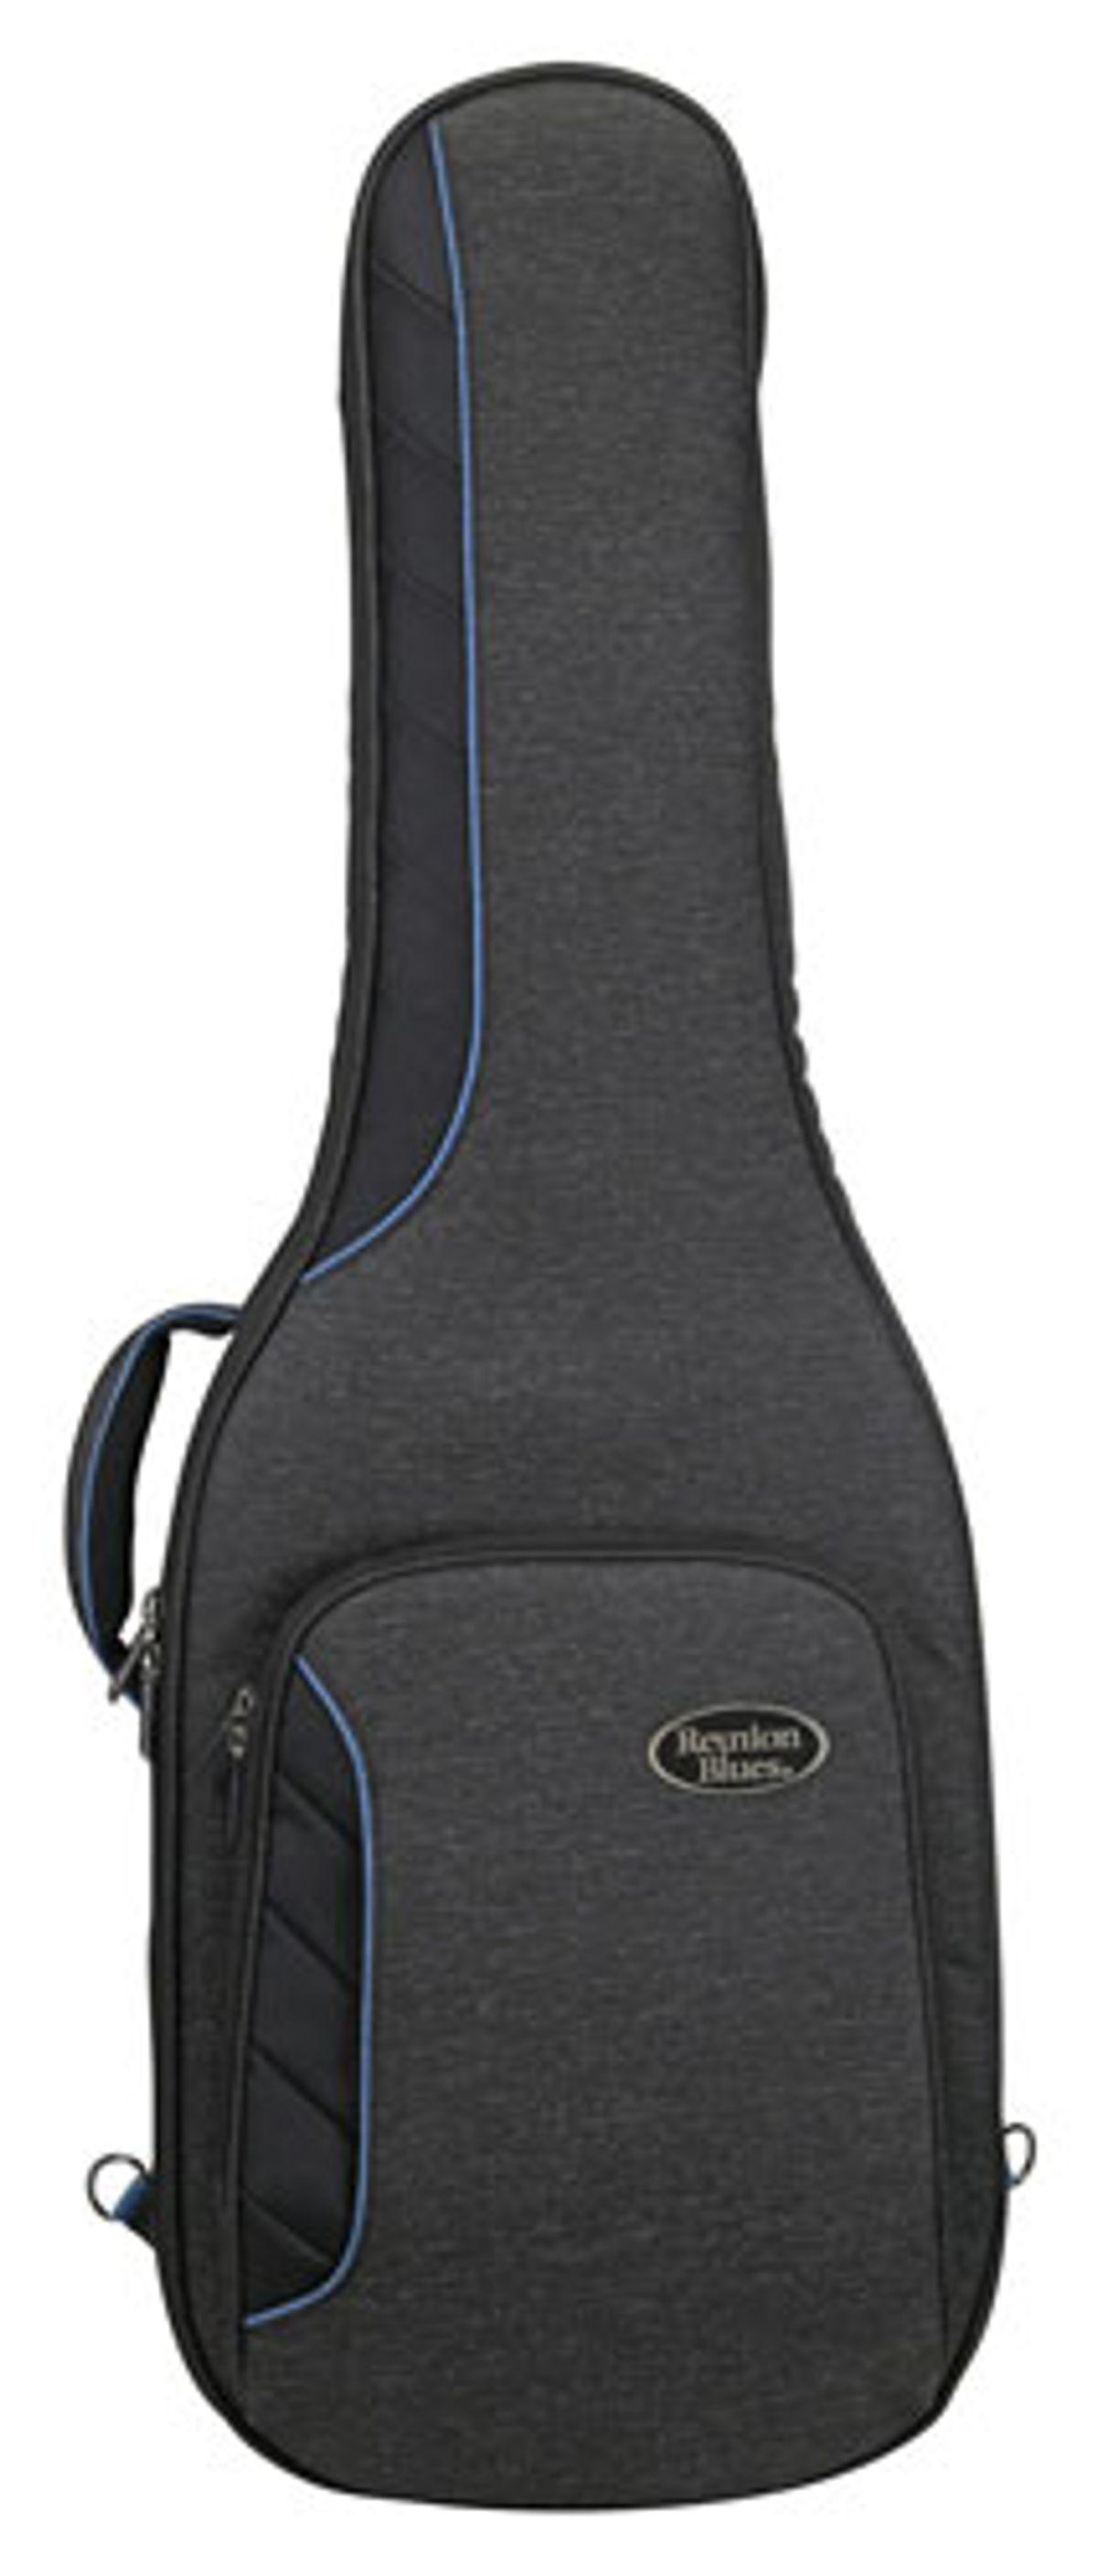 Reunion Blues Announces RB Continental Voyager Series Guitar Cases